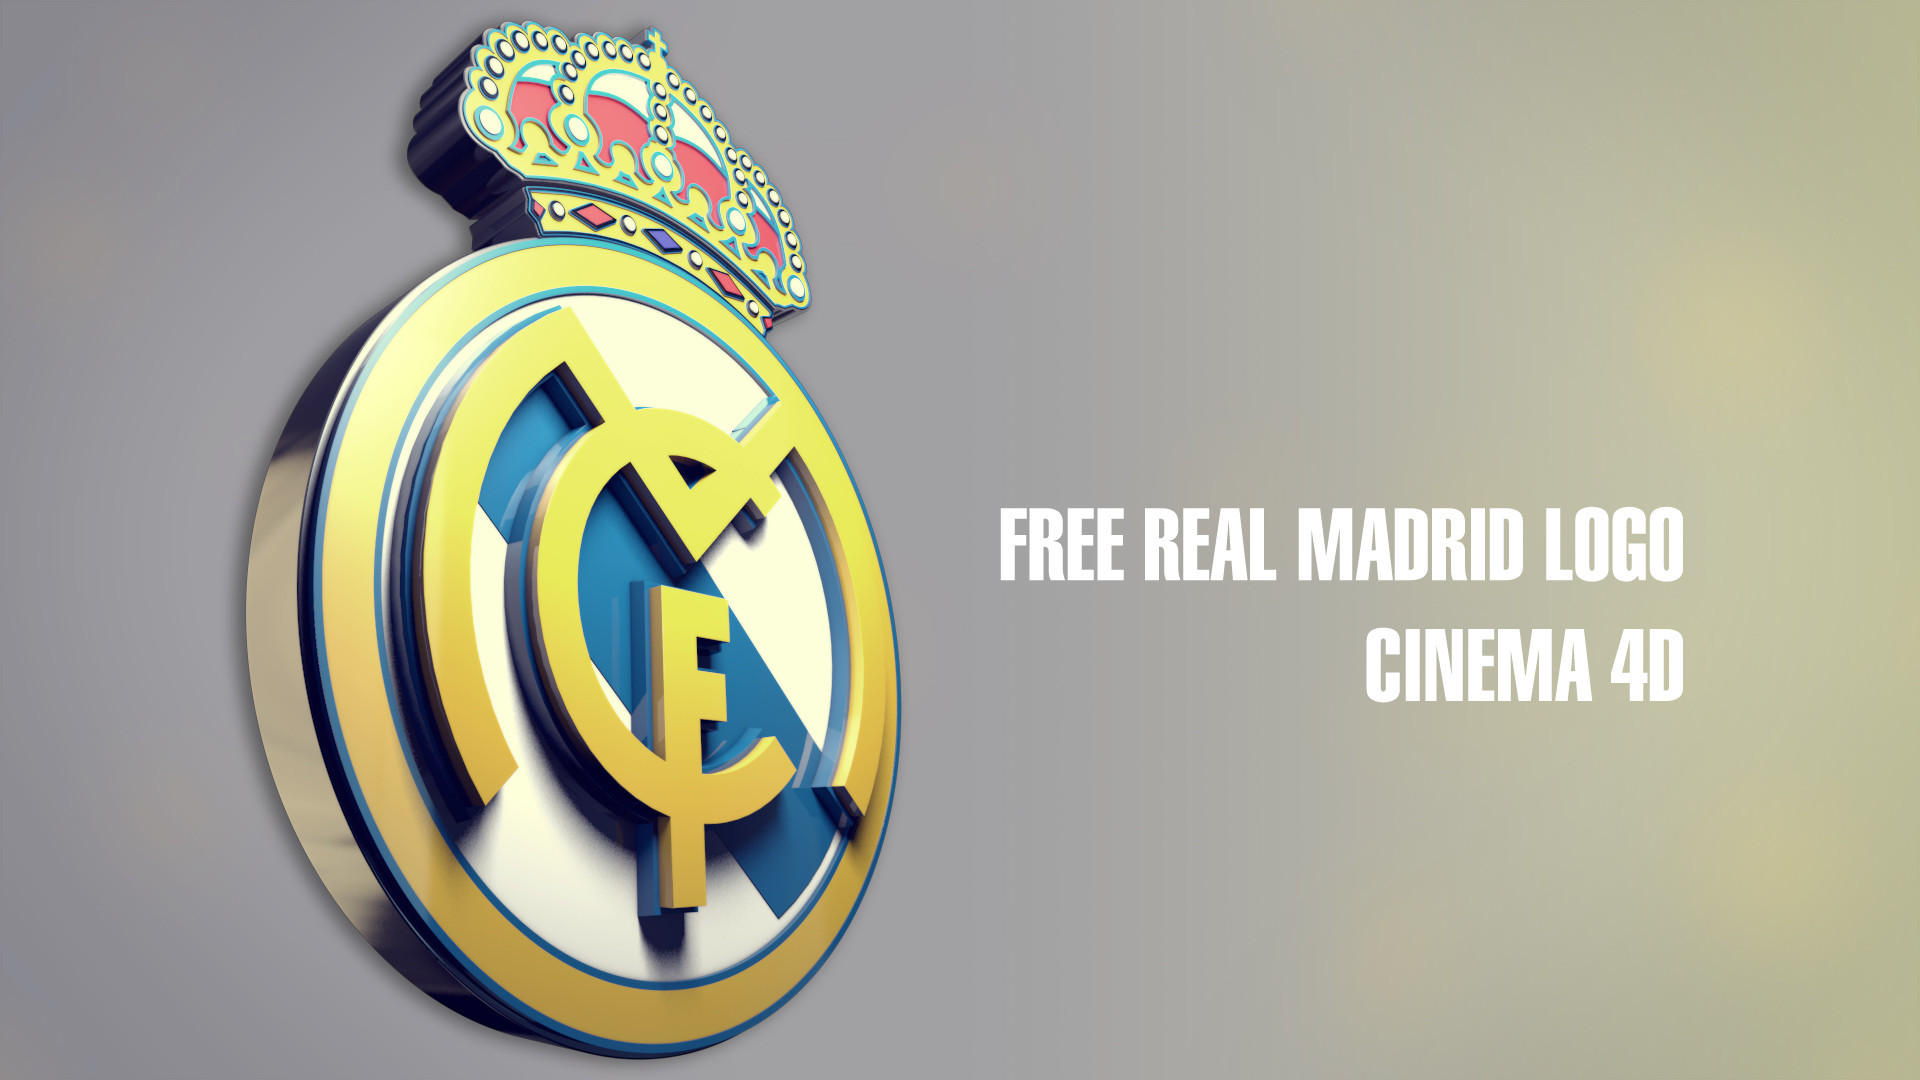 Wallpaper real madrid for windows xp - 1920x1080 1920x1080 Real Madrid 3d Logo Dekstop Wallpaper